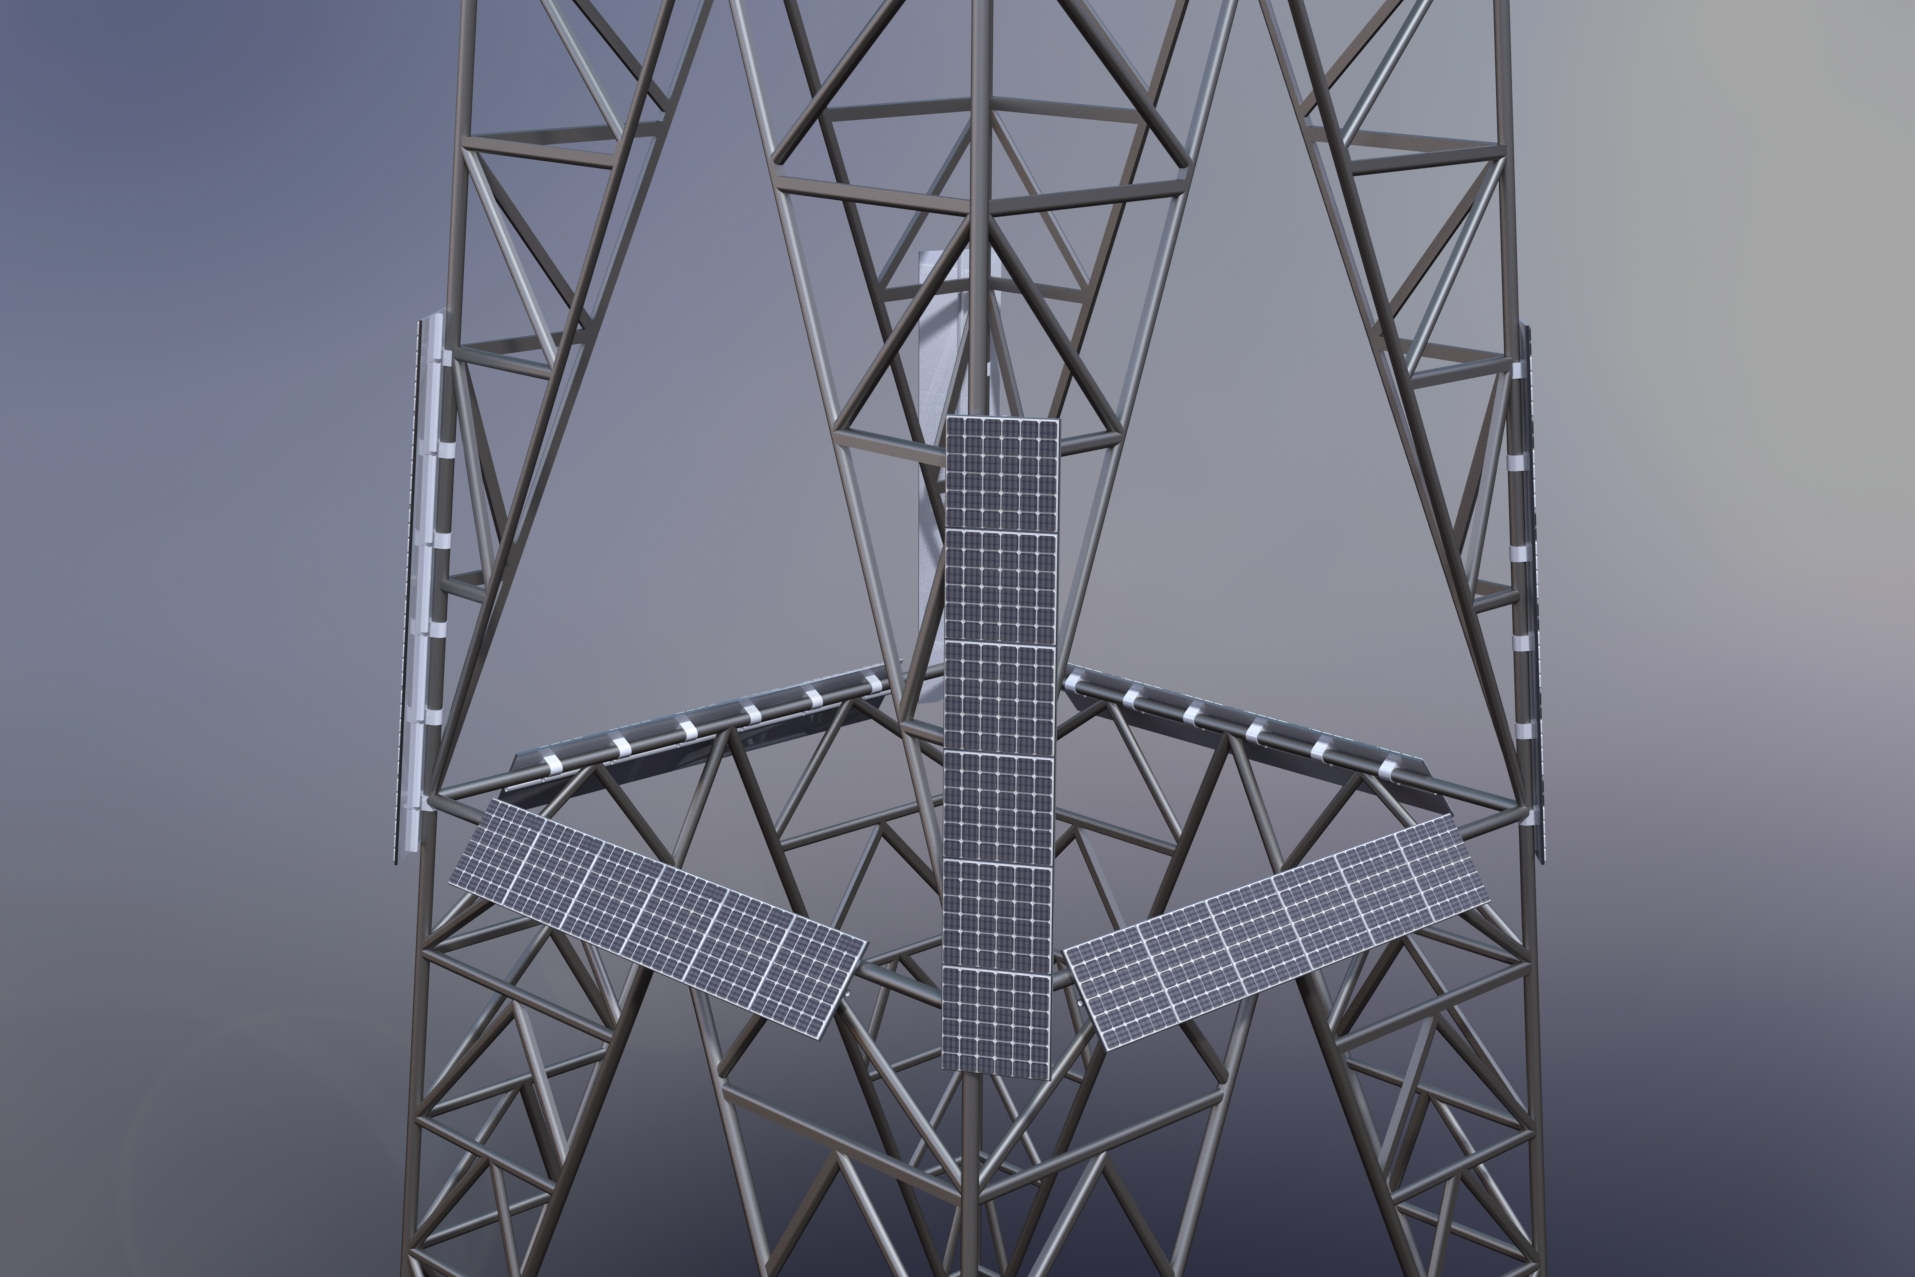 Eifile Lattice Tower Solar Panel Close Up.JPG